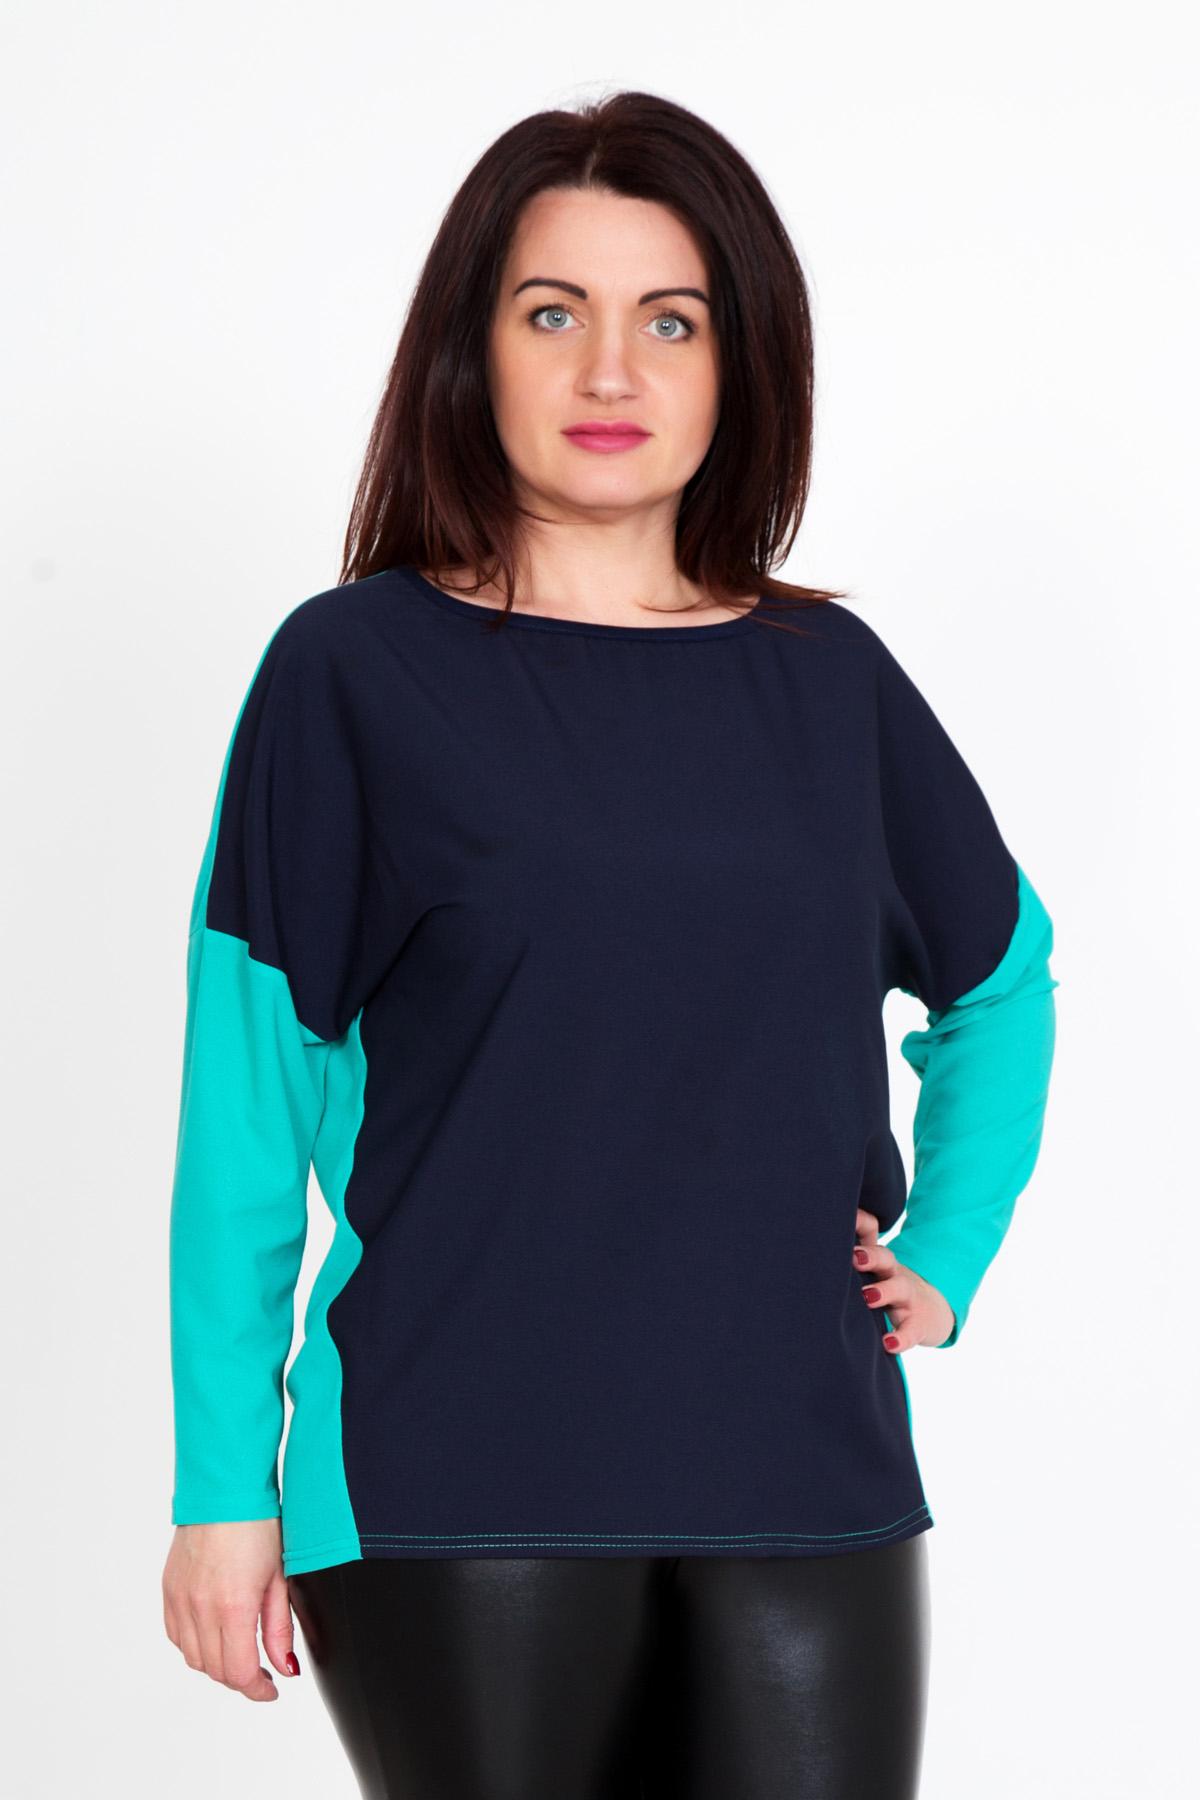 Жен. блуза  Наоми  р. 58 - Акции и скидки артикул: 25502